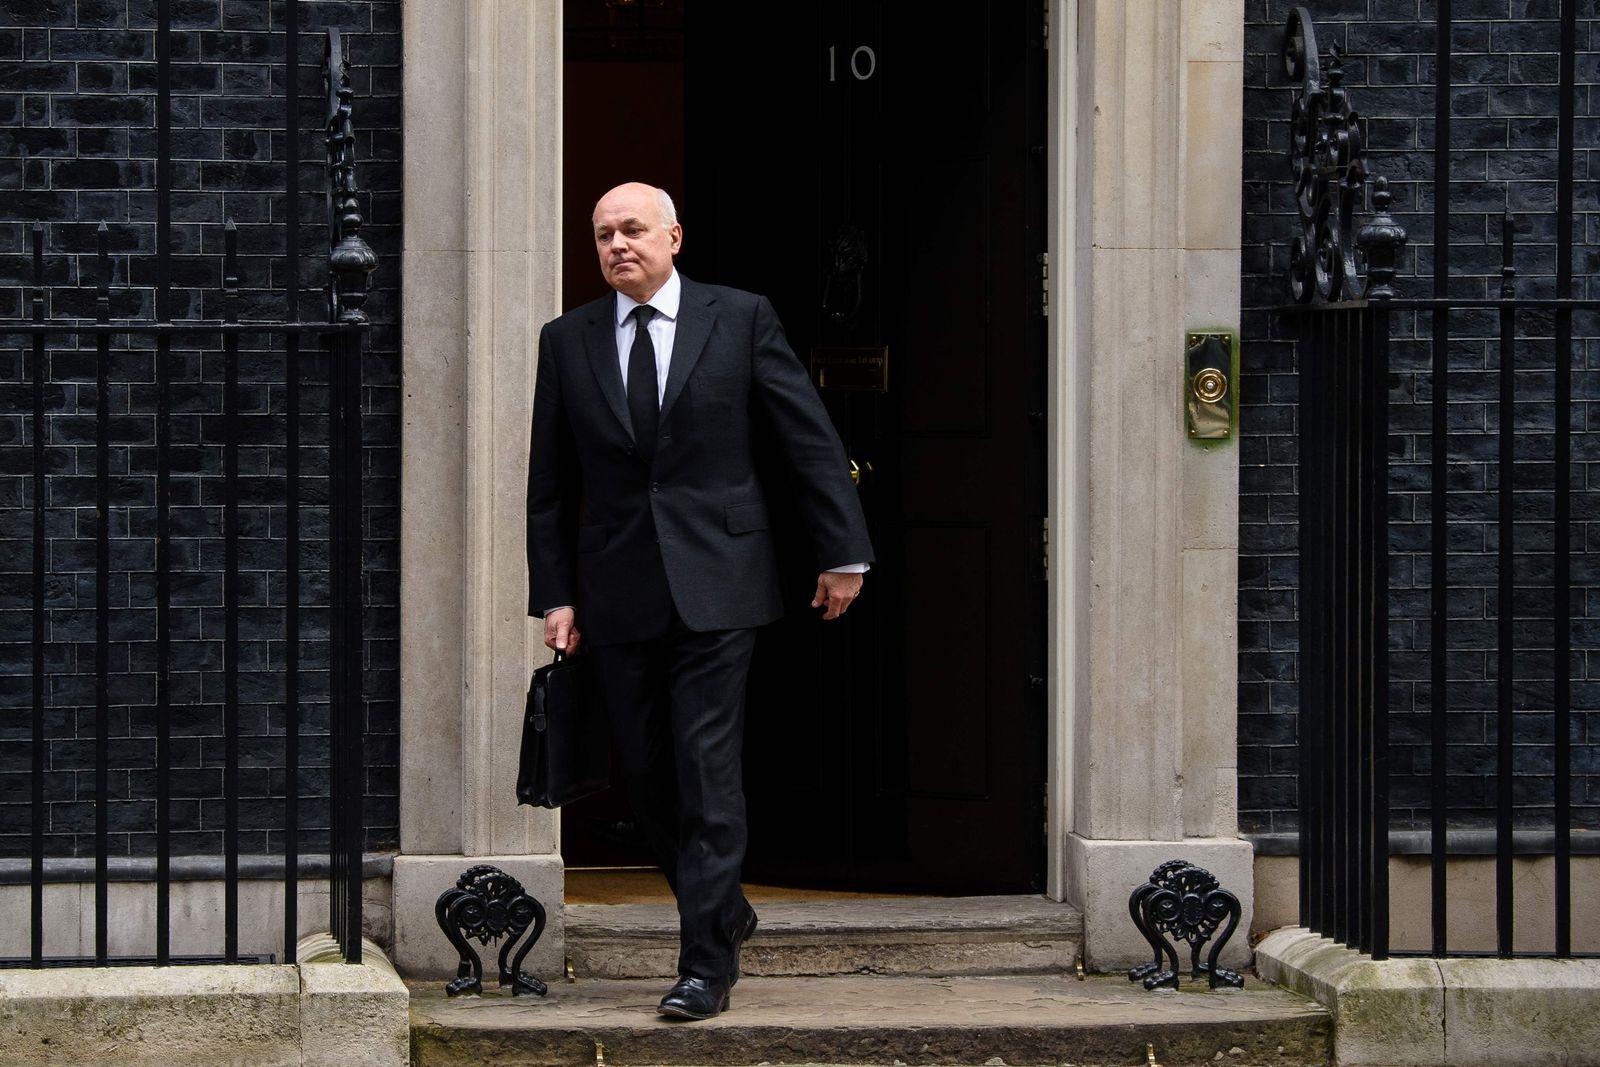 BRITAIN-POLITICS-WELFARE-RESIGNATION-FILES